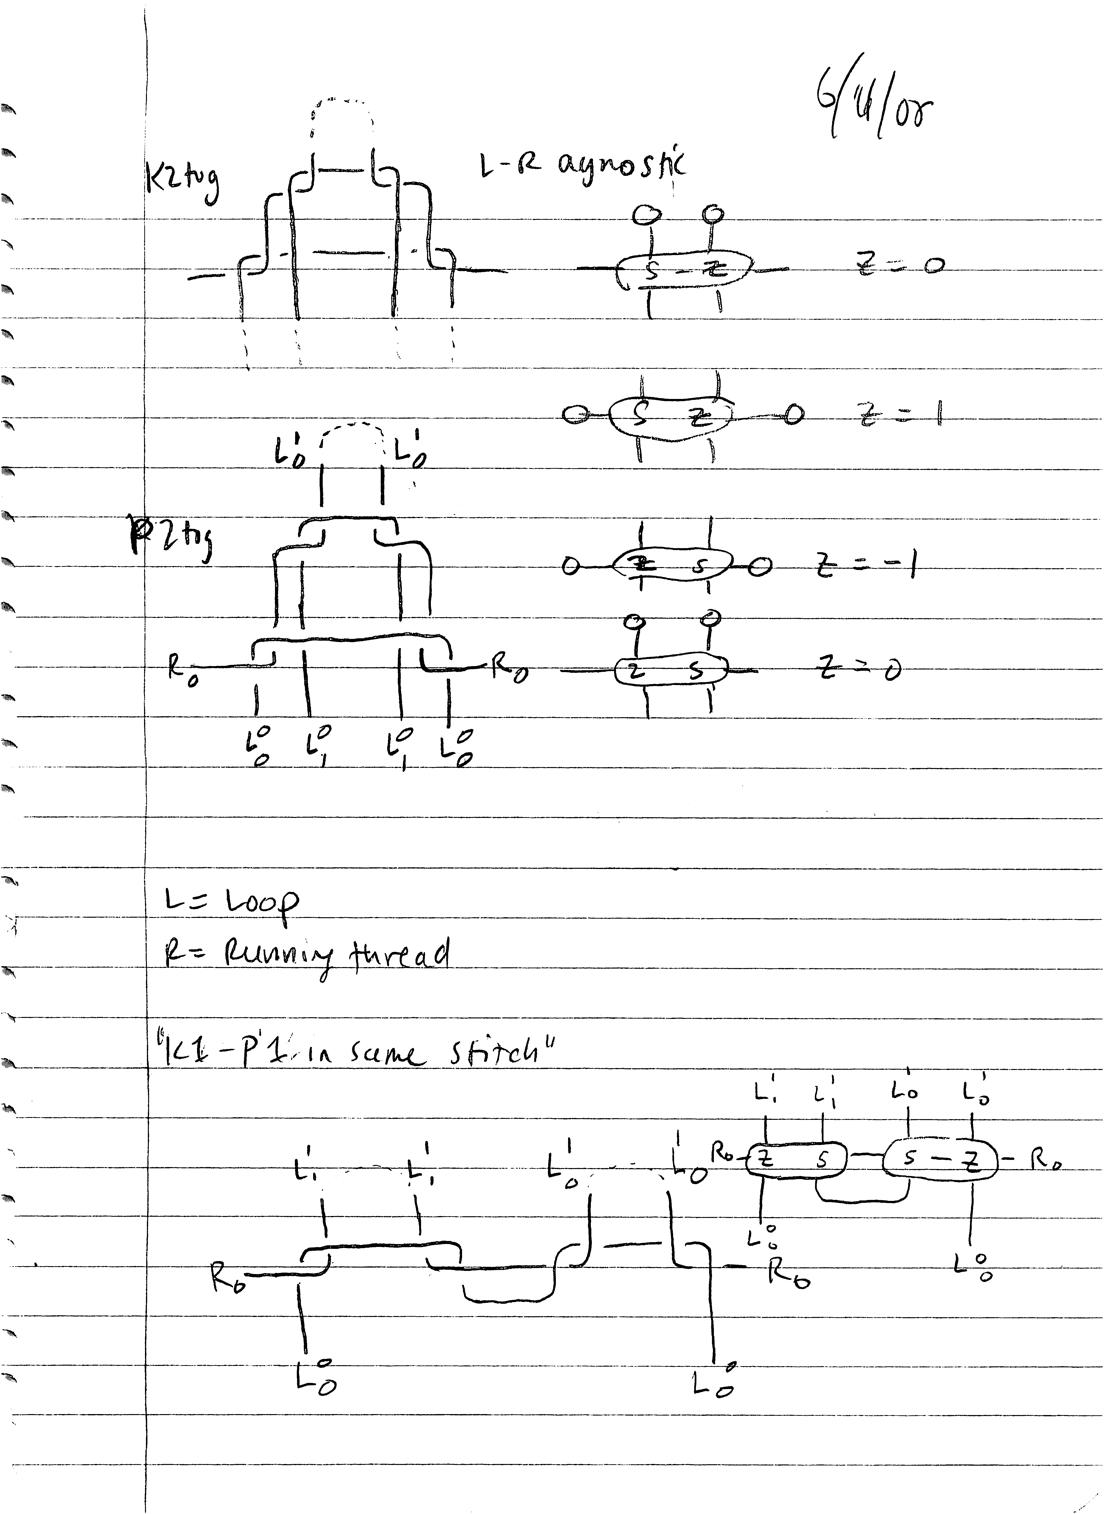 Orbital Notation Practice – Orbital Notation Worksheet